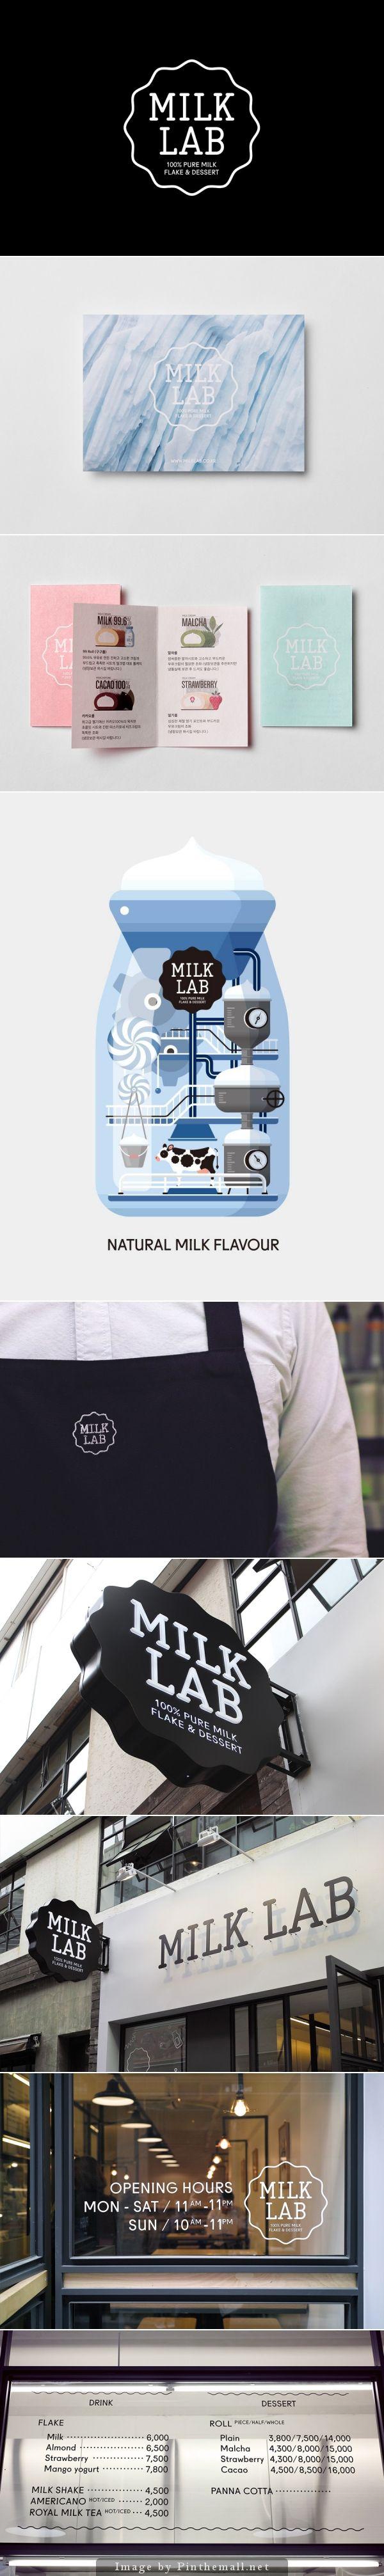 Milk Lab Branding by Studio FNT